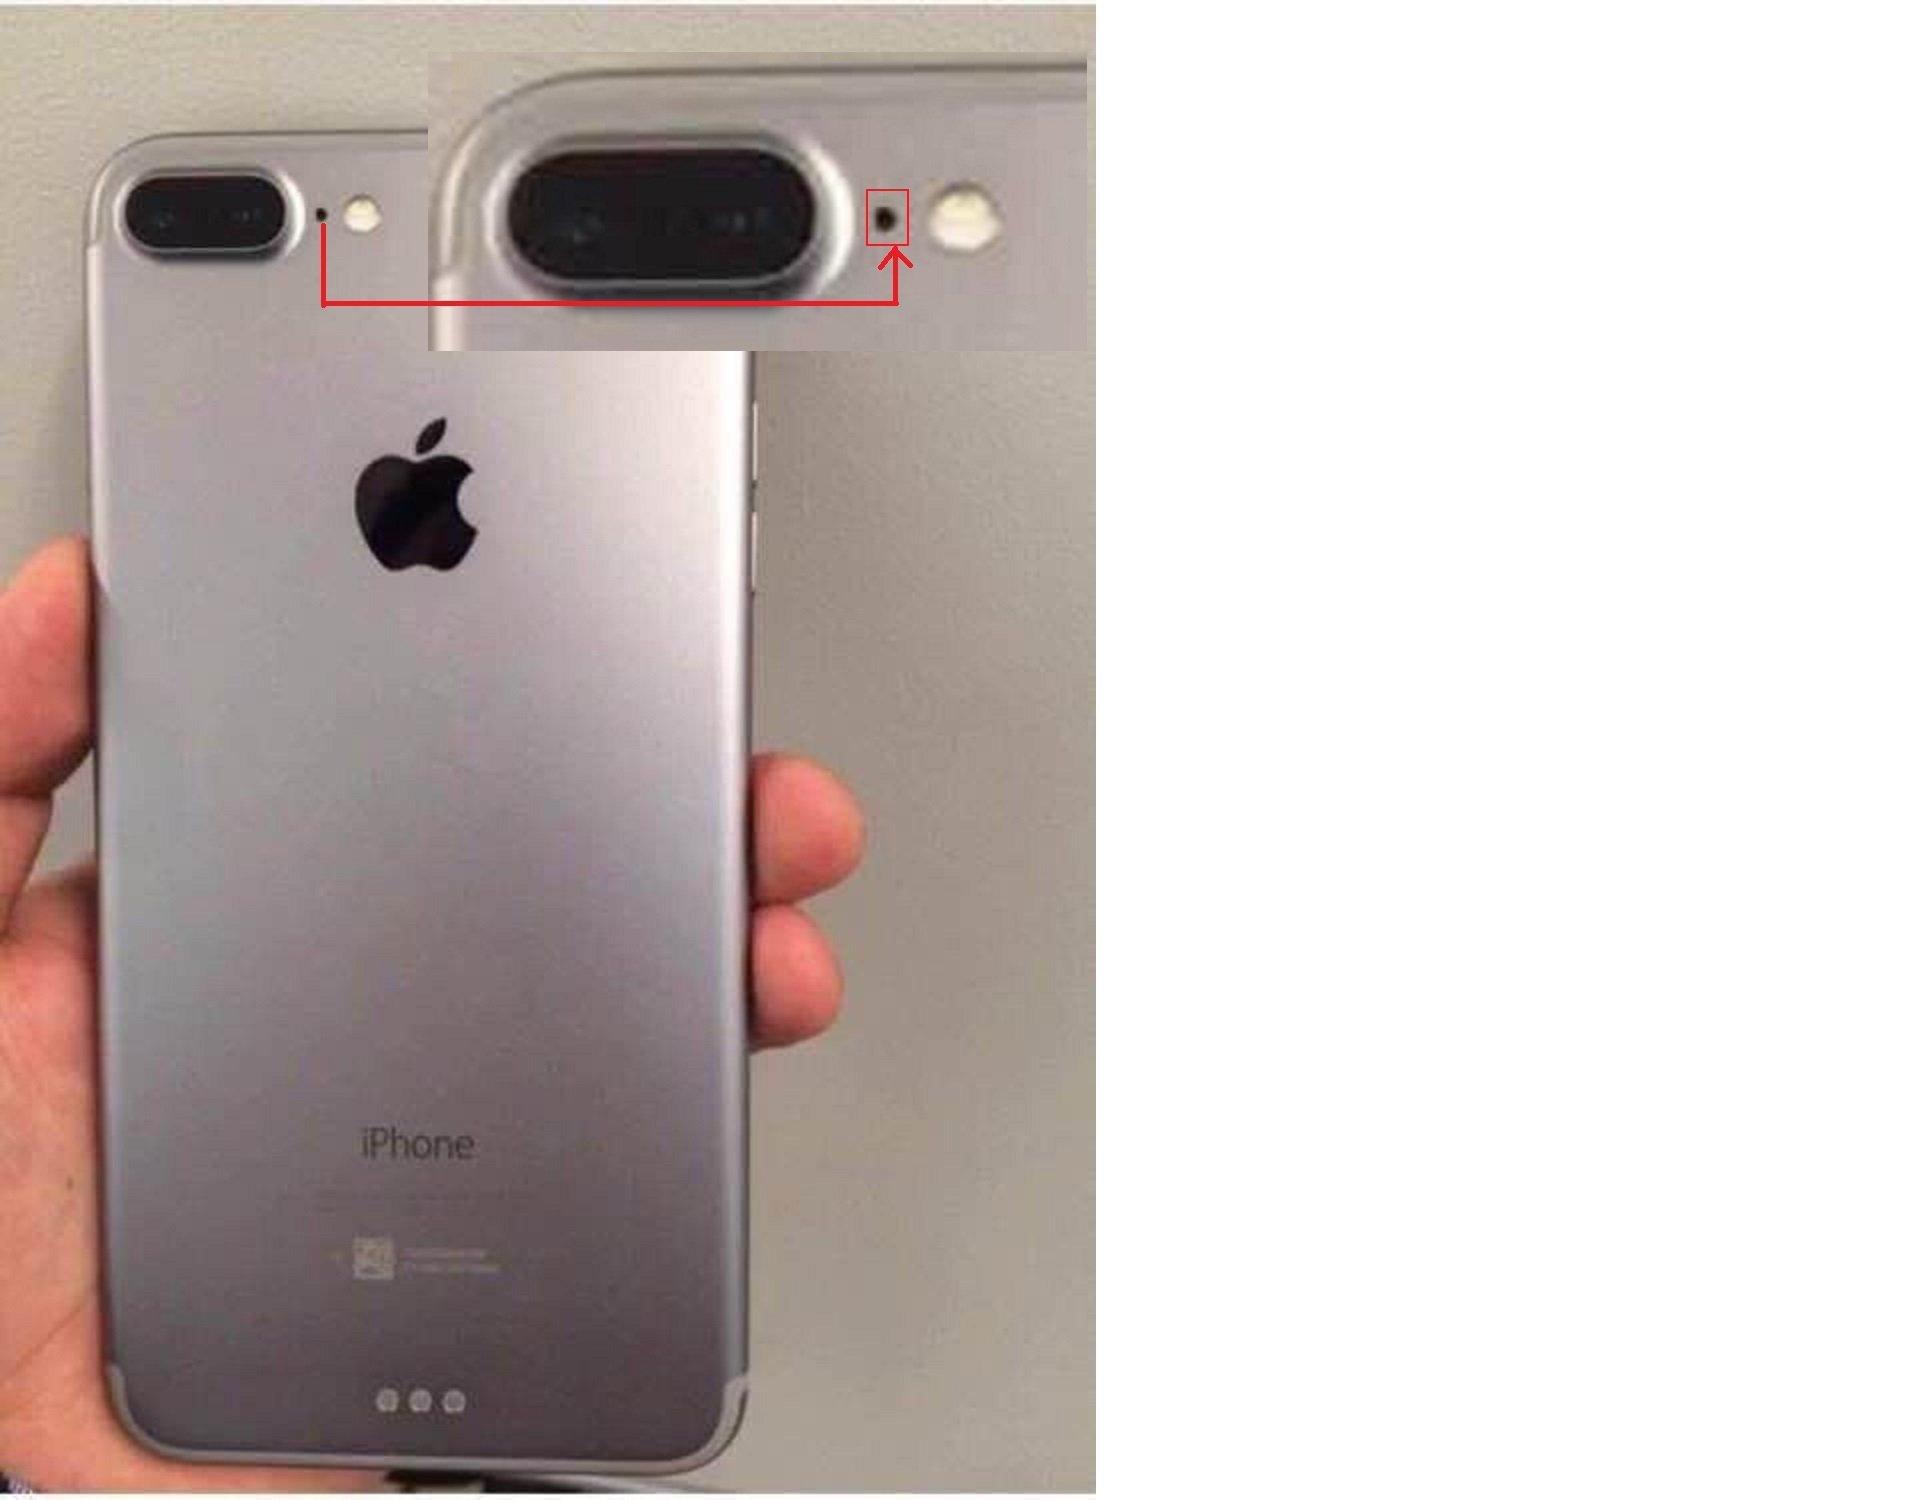 The iPhone 7 leak is 100% fake | MacRumors Forums